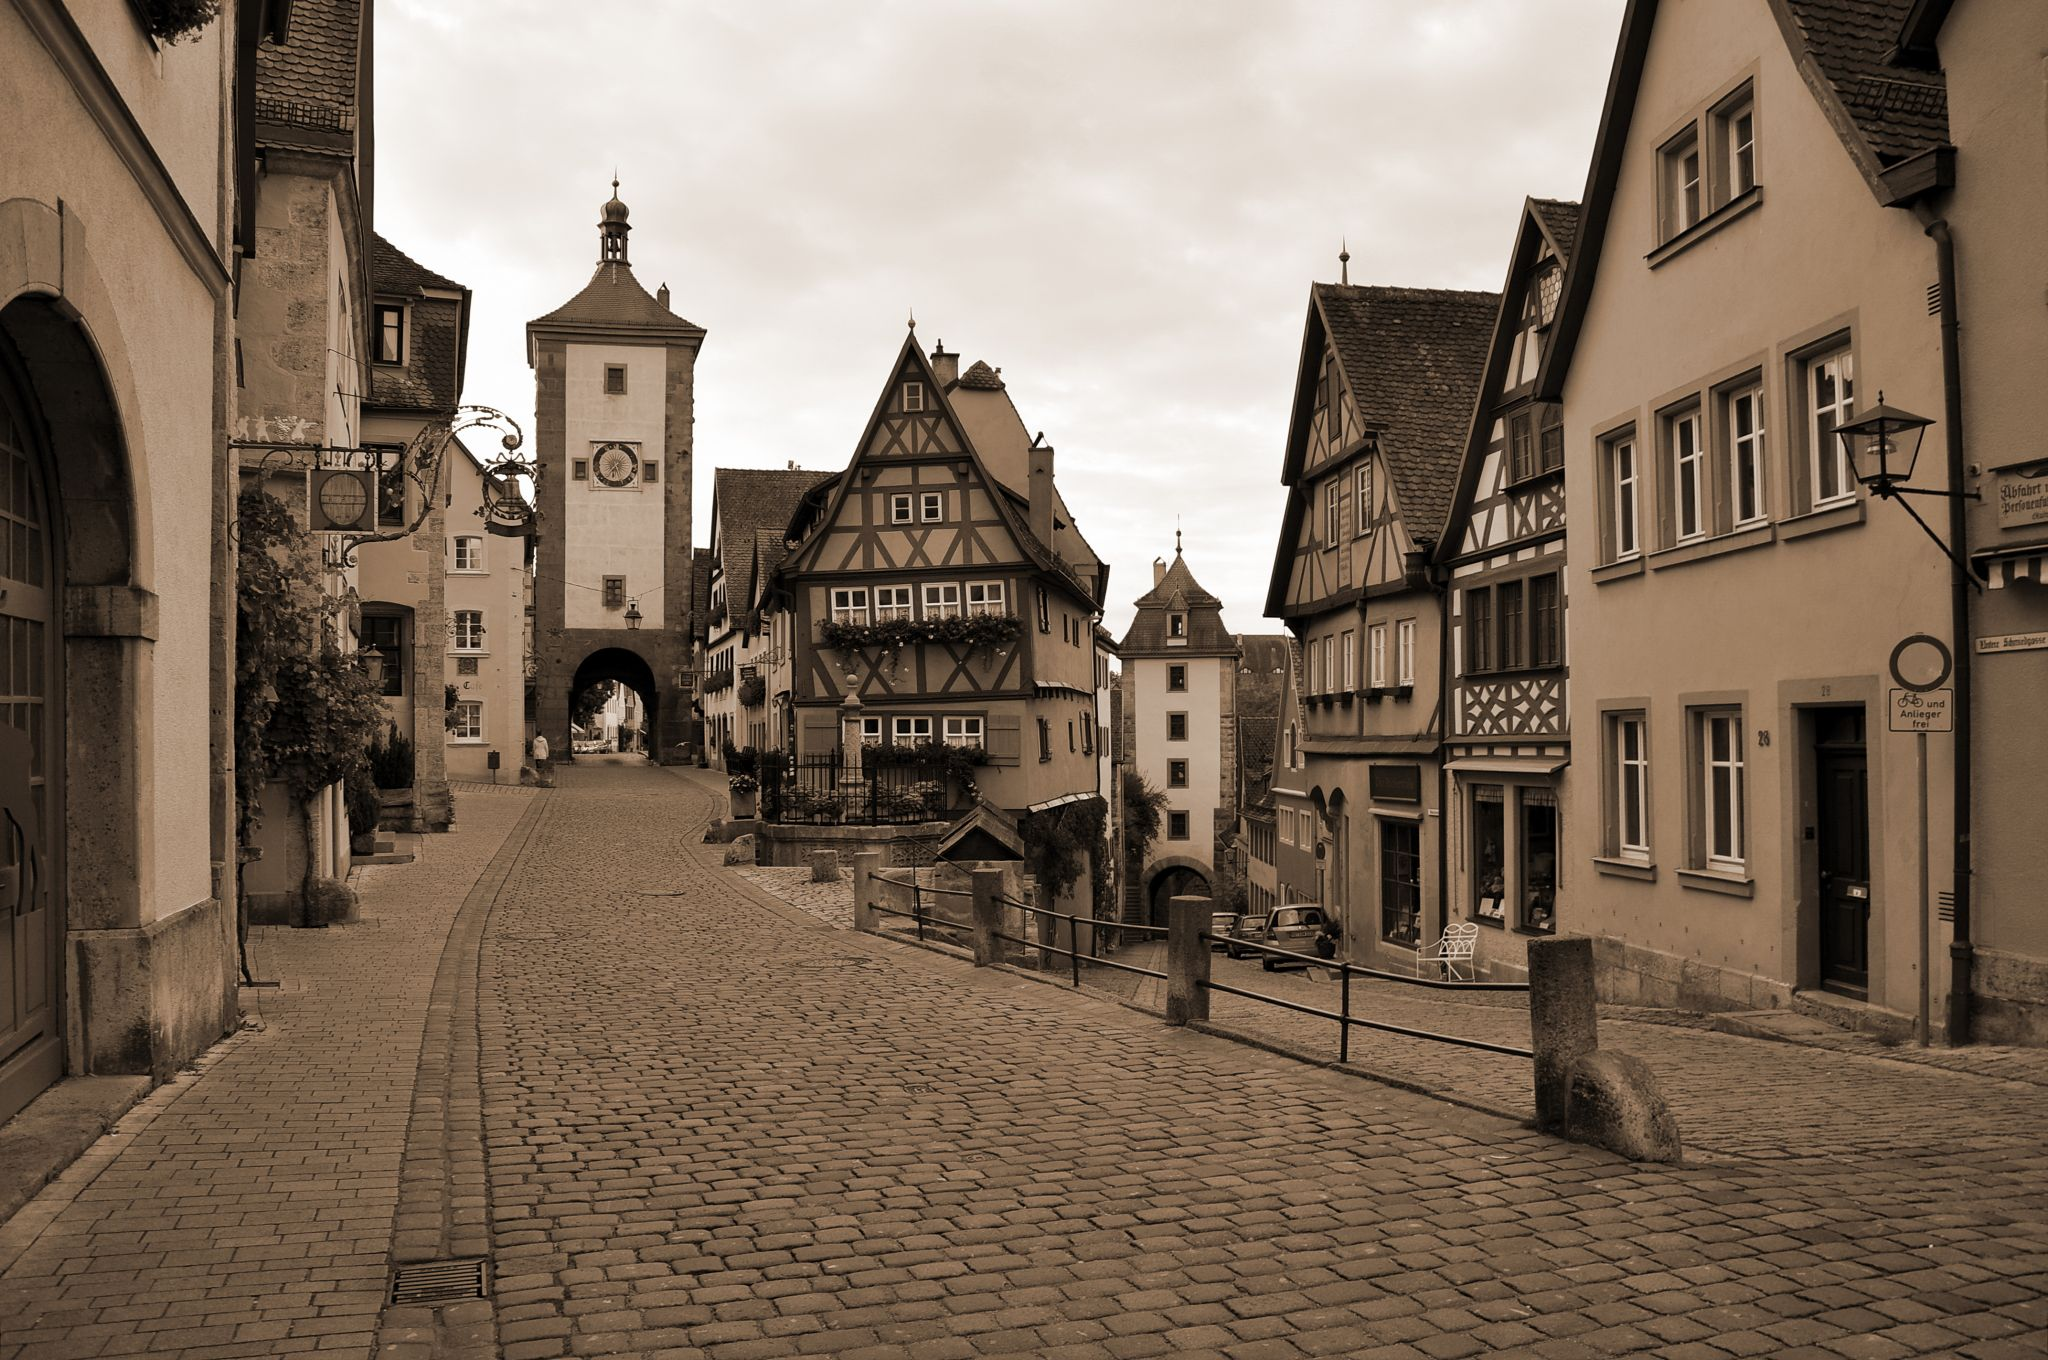 Plönlein Rothenburg ob der Tauber, Germany